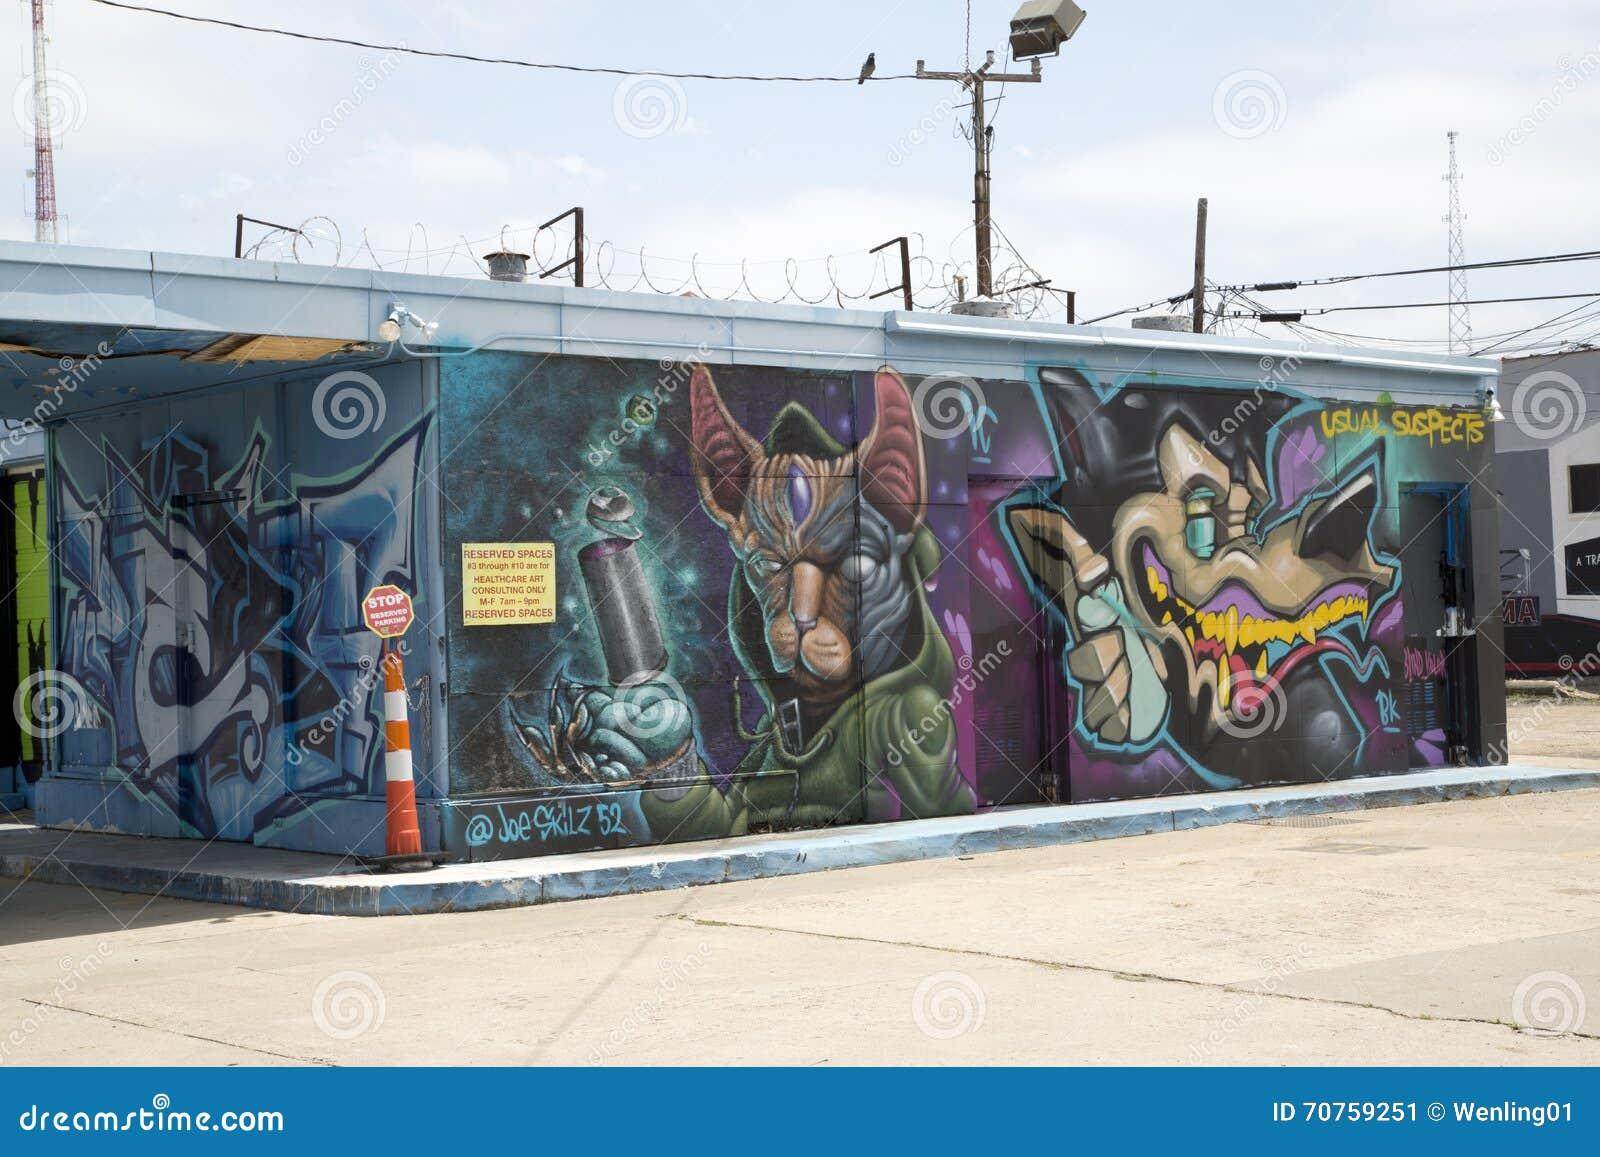 Graffiti wall dallas - Building Colorful Dallas Deep Ellum Graffiti Wall